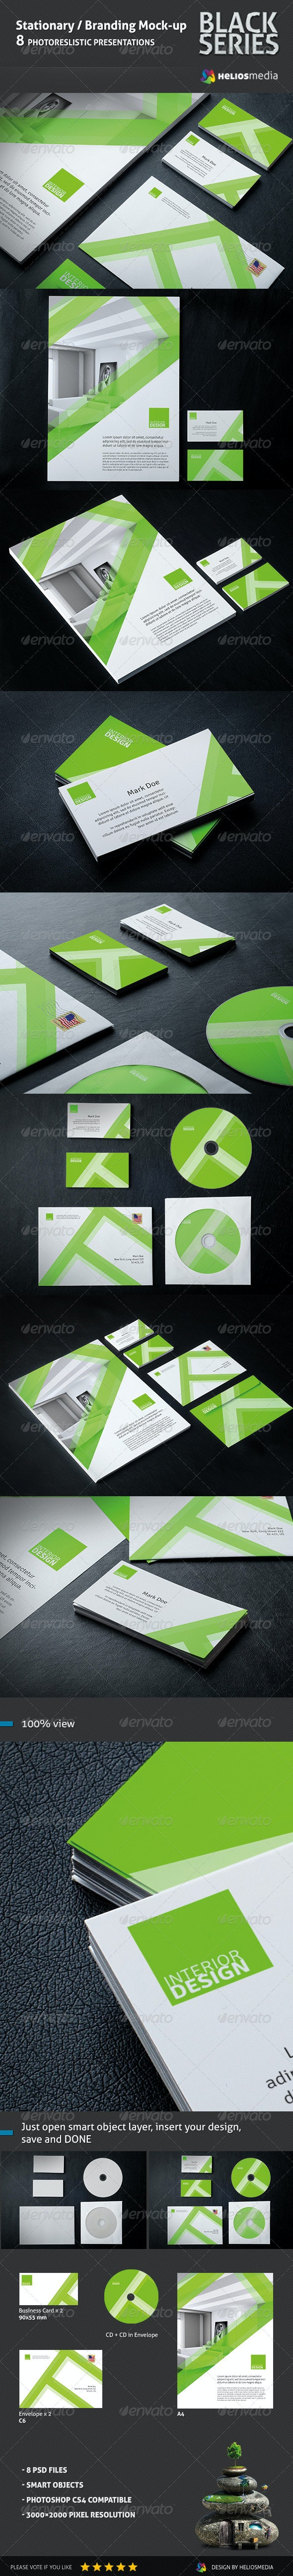 Stationery / Branding BlackSeries Mockup - Stationery Print